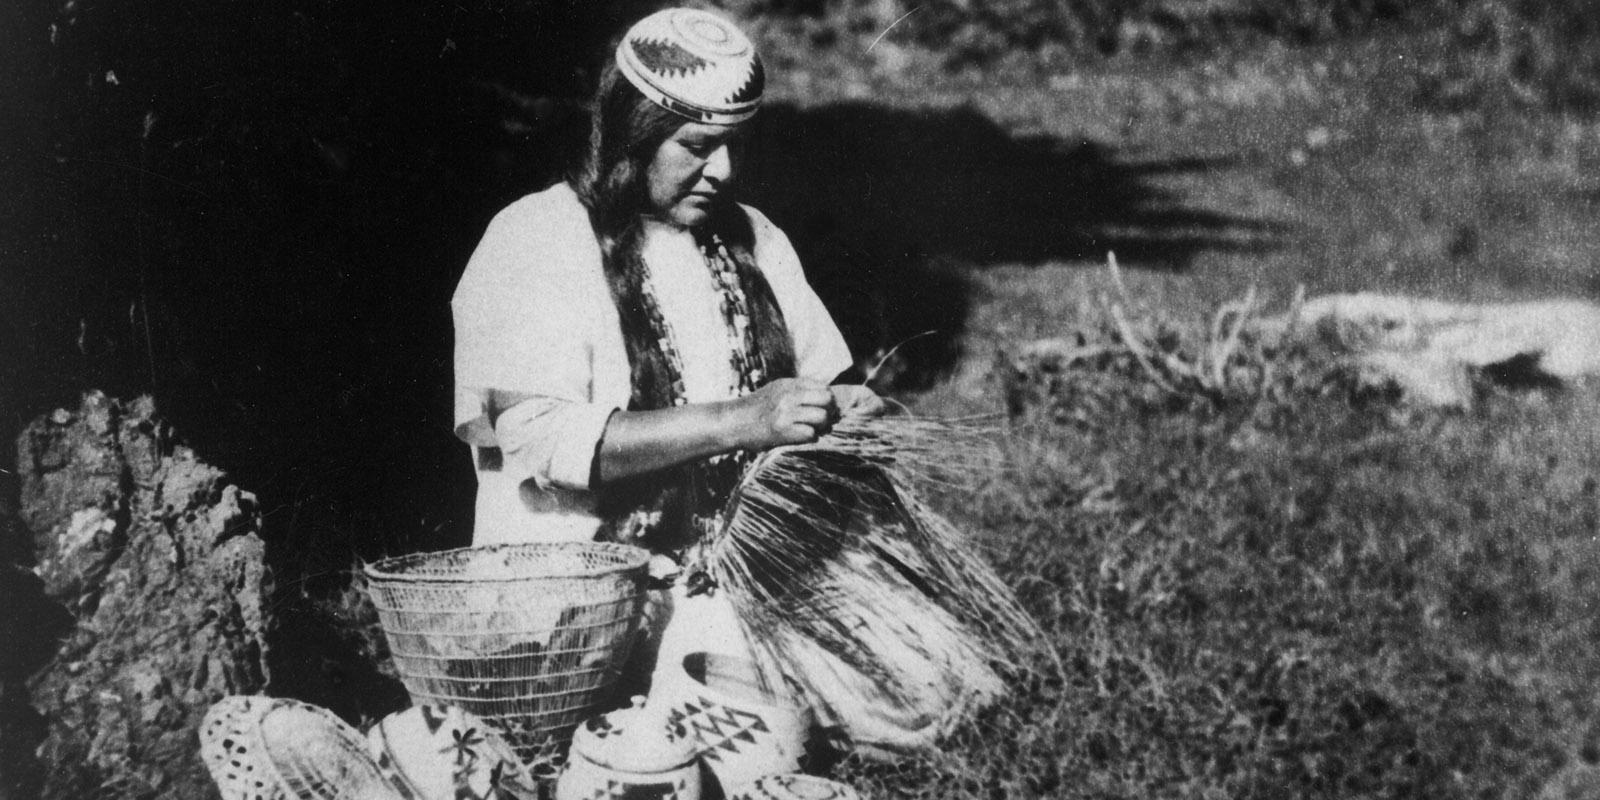 Indians Basket Weaving-1